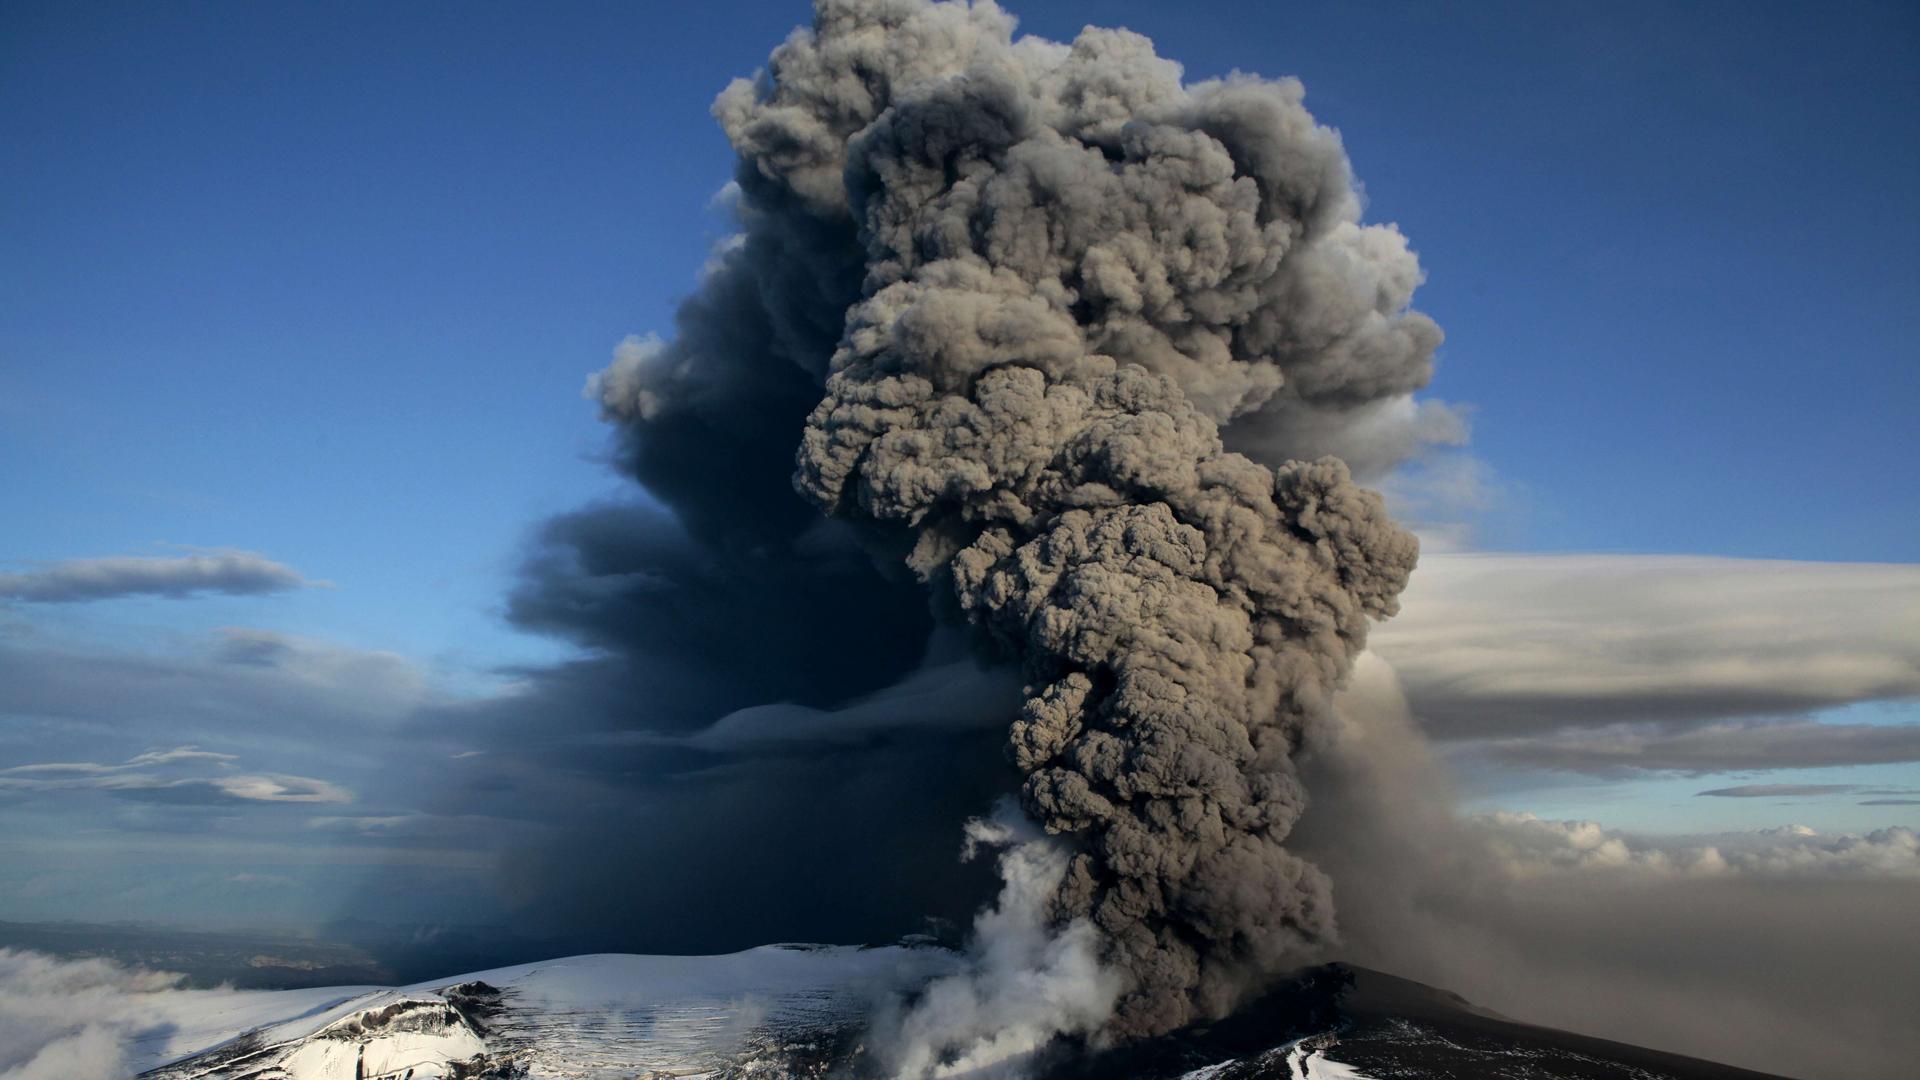 Ausbruch des isländischen Vulkans Eyjafjallajökull, Aschewolke